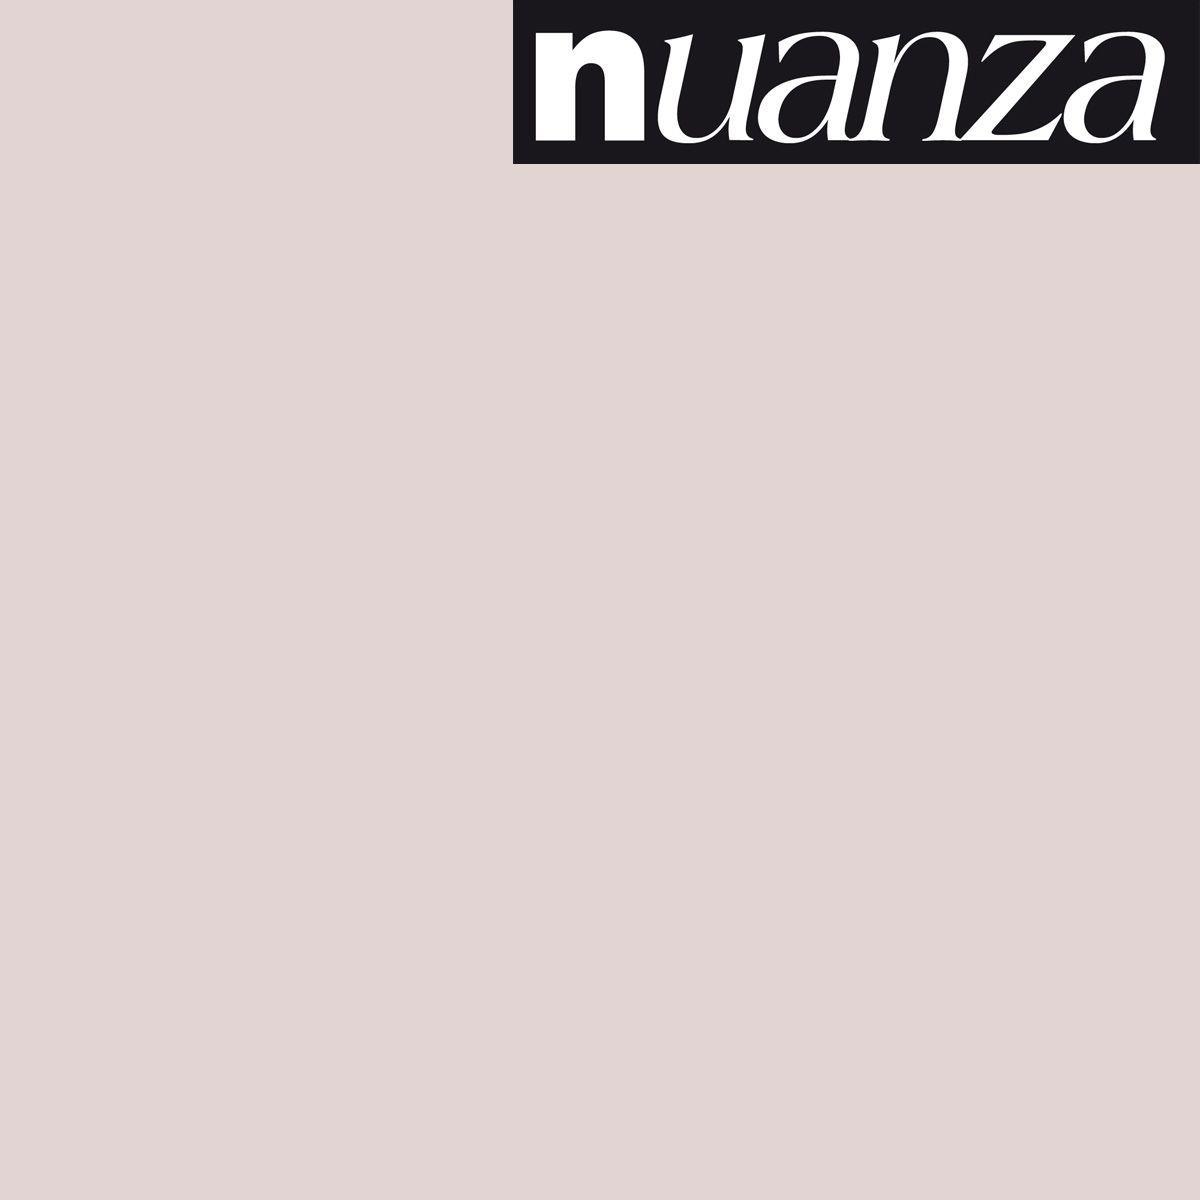 Peinture rose pâle satin multisupports Nuanza 2.5l